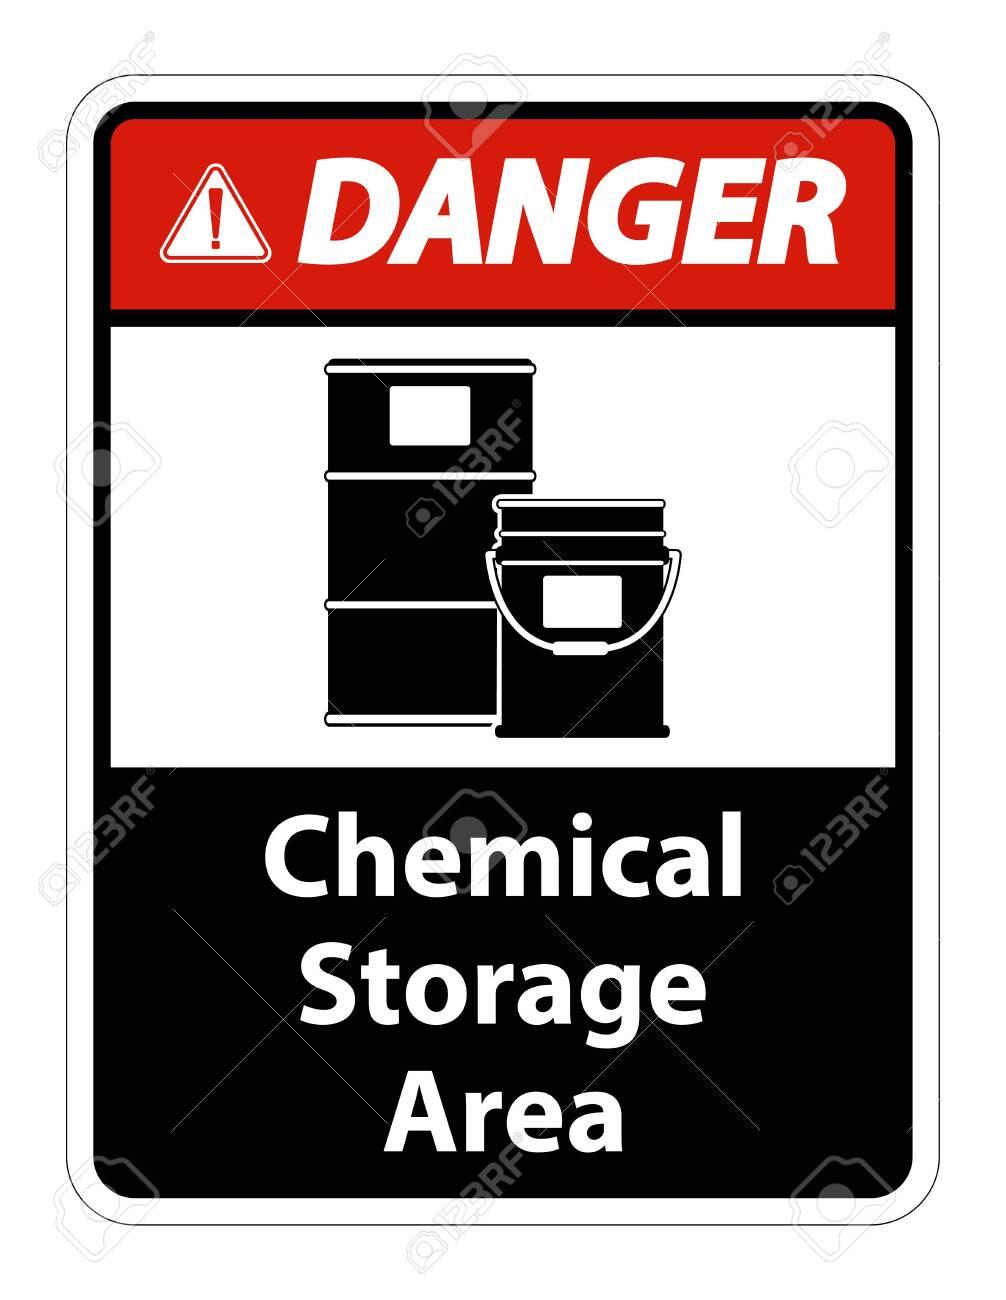 Danger Chemical Storage Symbol Sign Isolate on transparent Background,Vector Illustration - 145736692